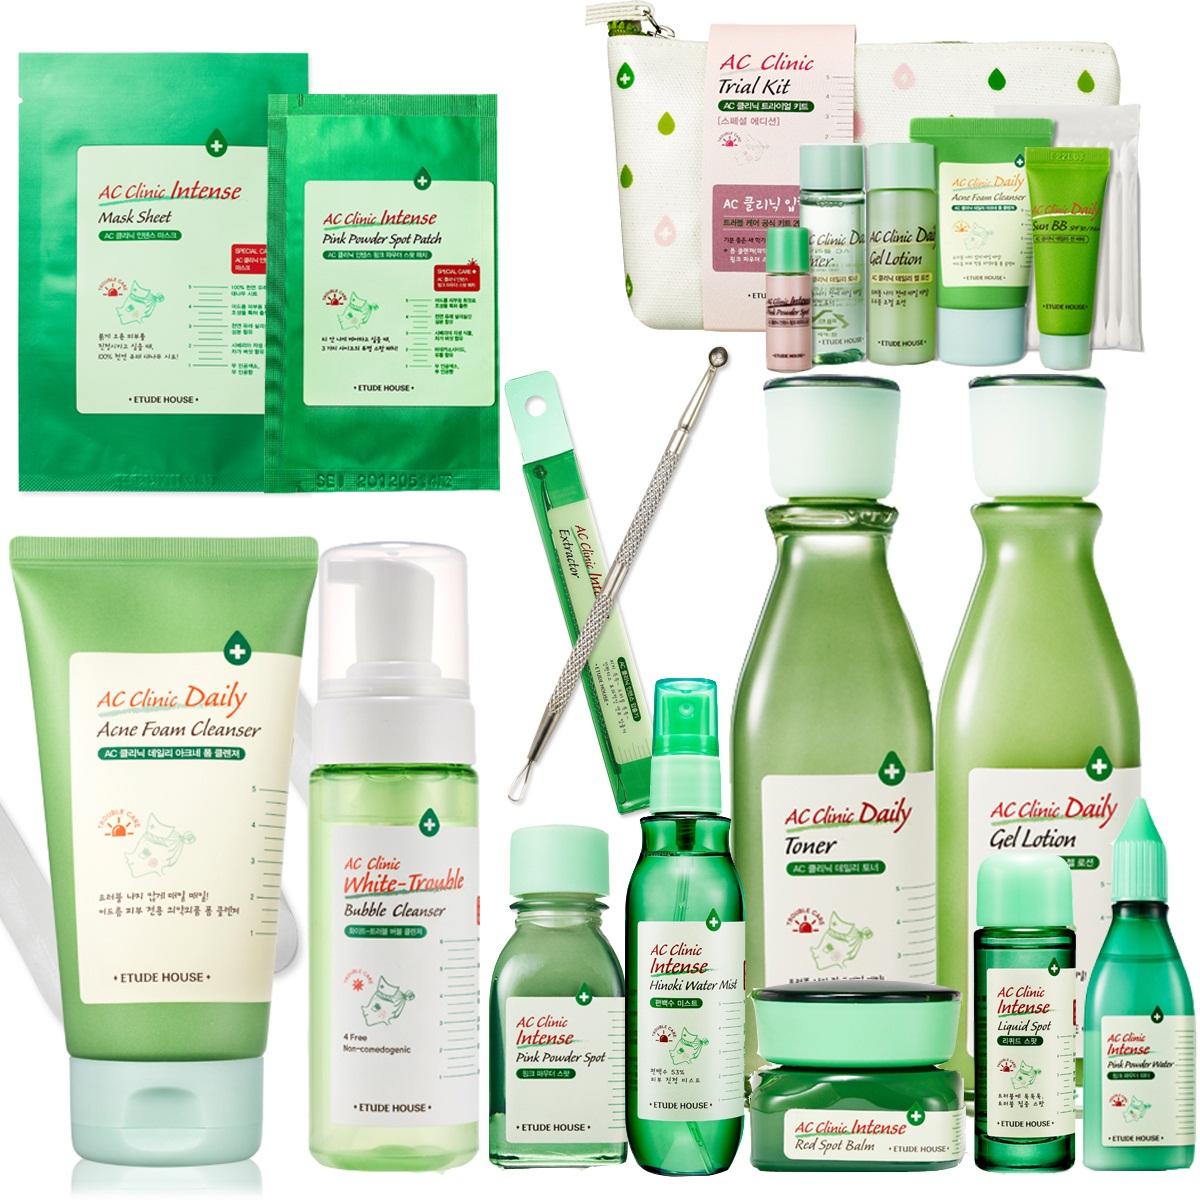 Skin Care Viva Untuk Kulit Berminyak: The Beauty Sweet Spot: REVIEW : Etude House AC Clinic